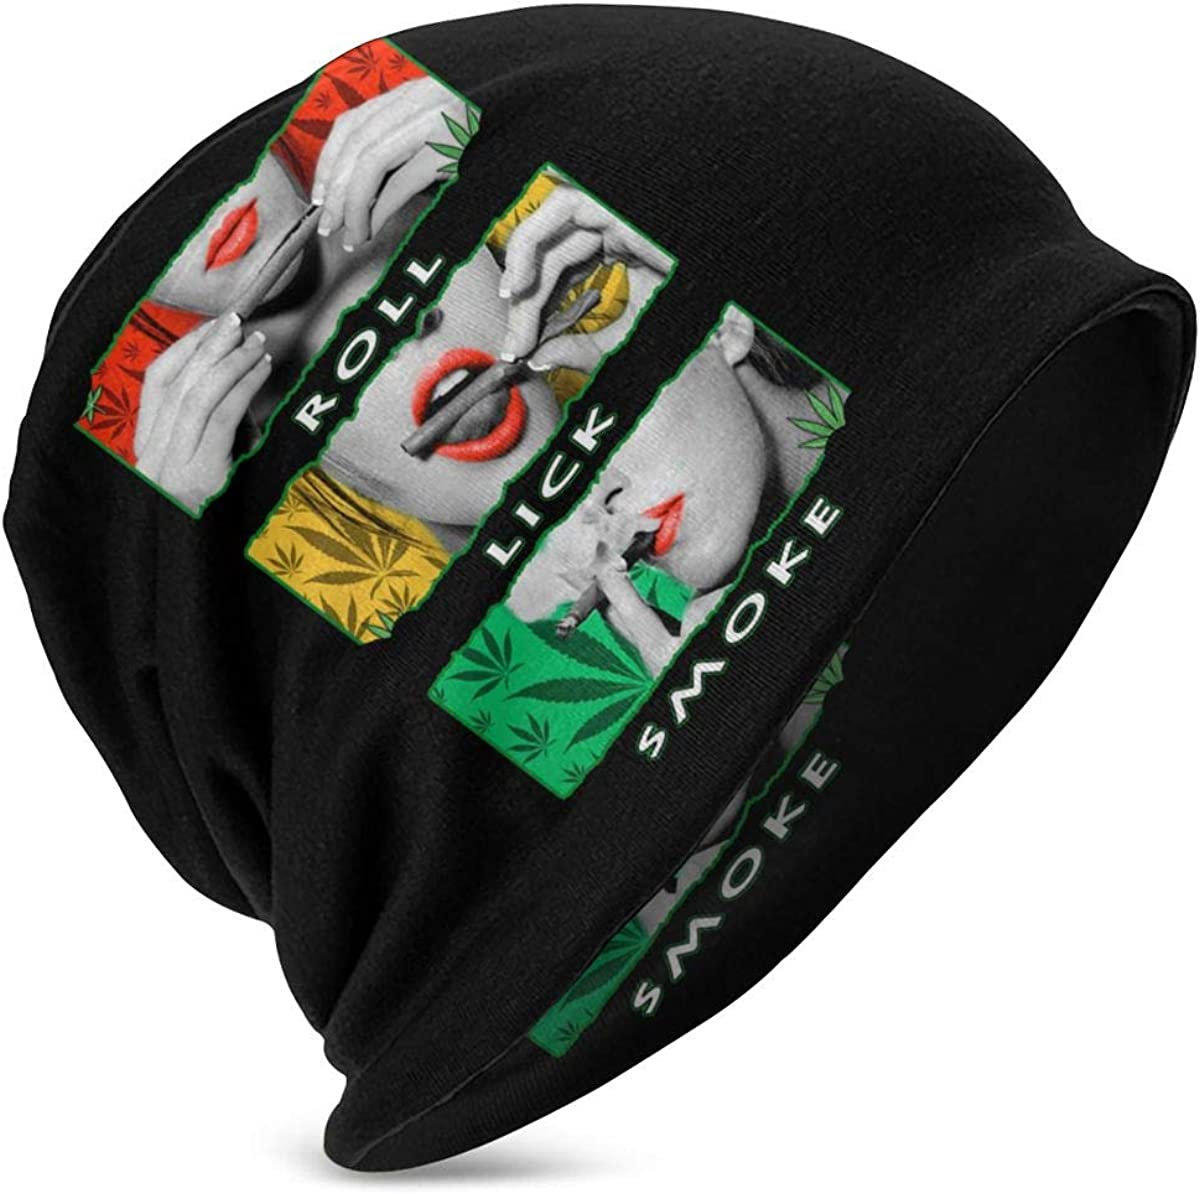 Slotley Beanie Caps Roll It Lick It Smoke It Marijuana Pot Weed Skull Cap Knitting Hat Comfortable Warm Knit Hats for Girls Boys Black